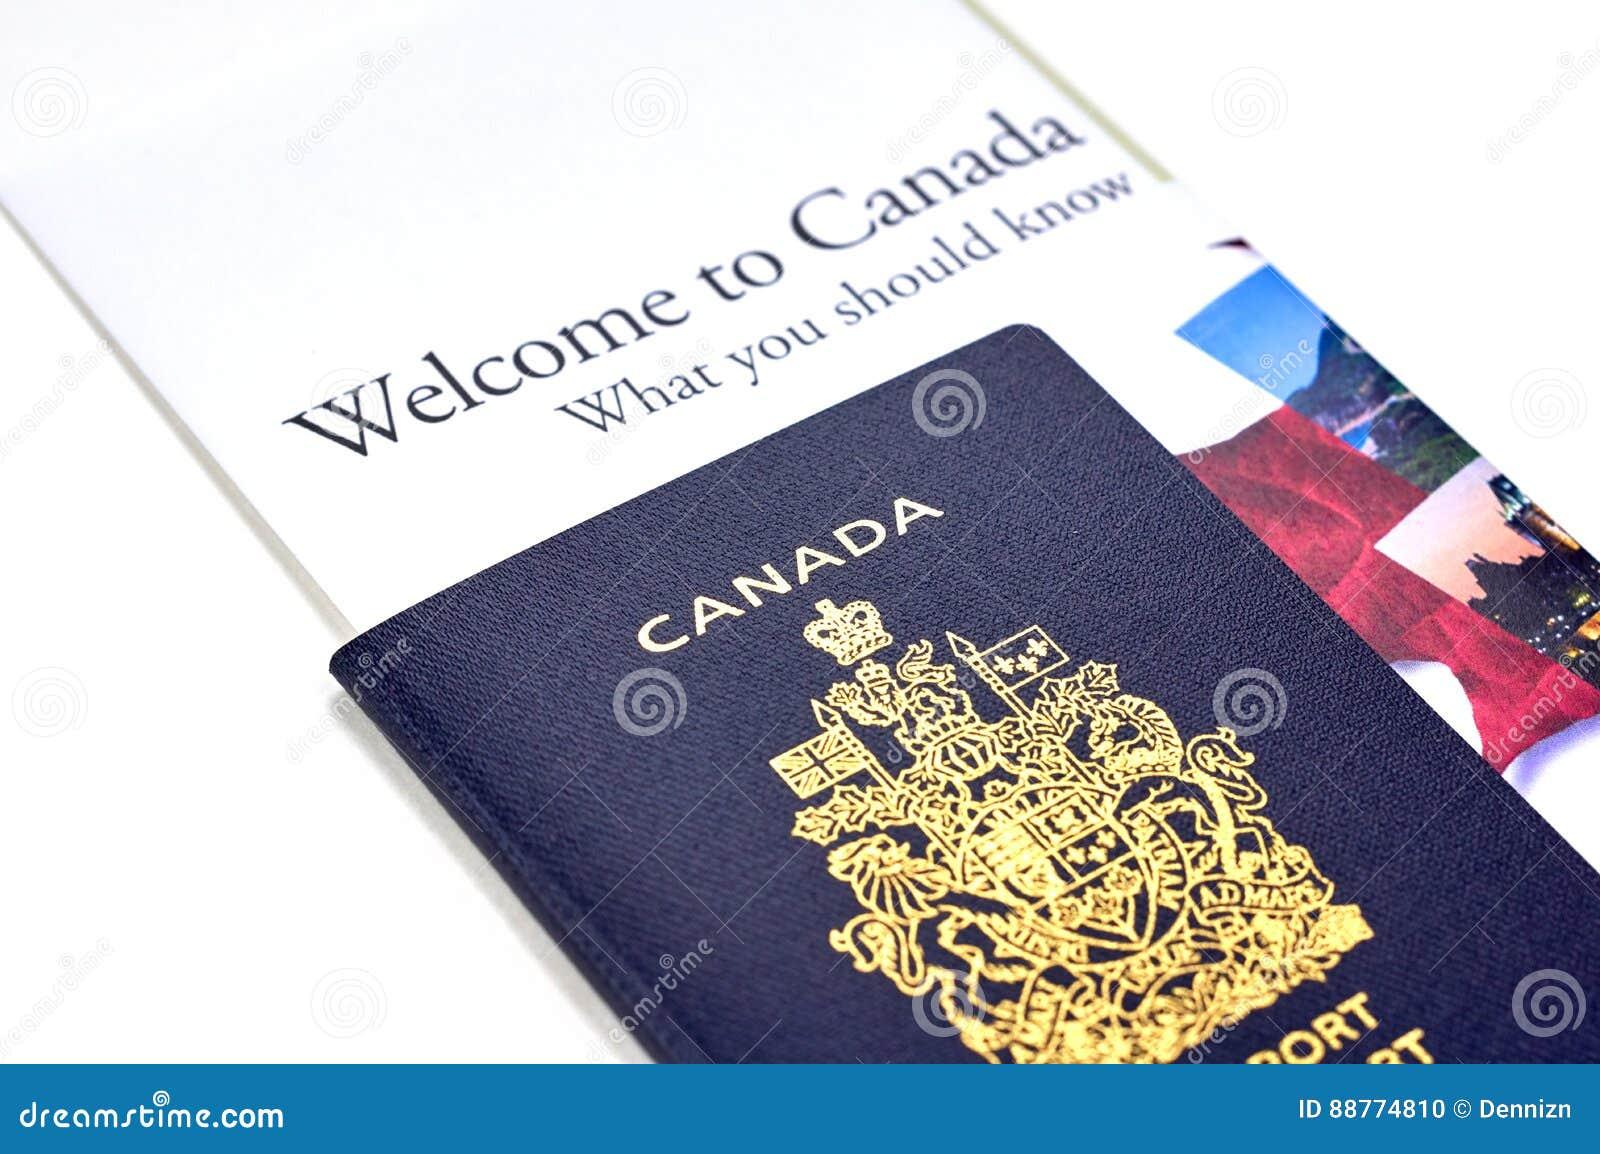 Pasaporte Canadiense Con Un Folleto Imagen editorial - Imagen de ...